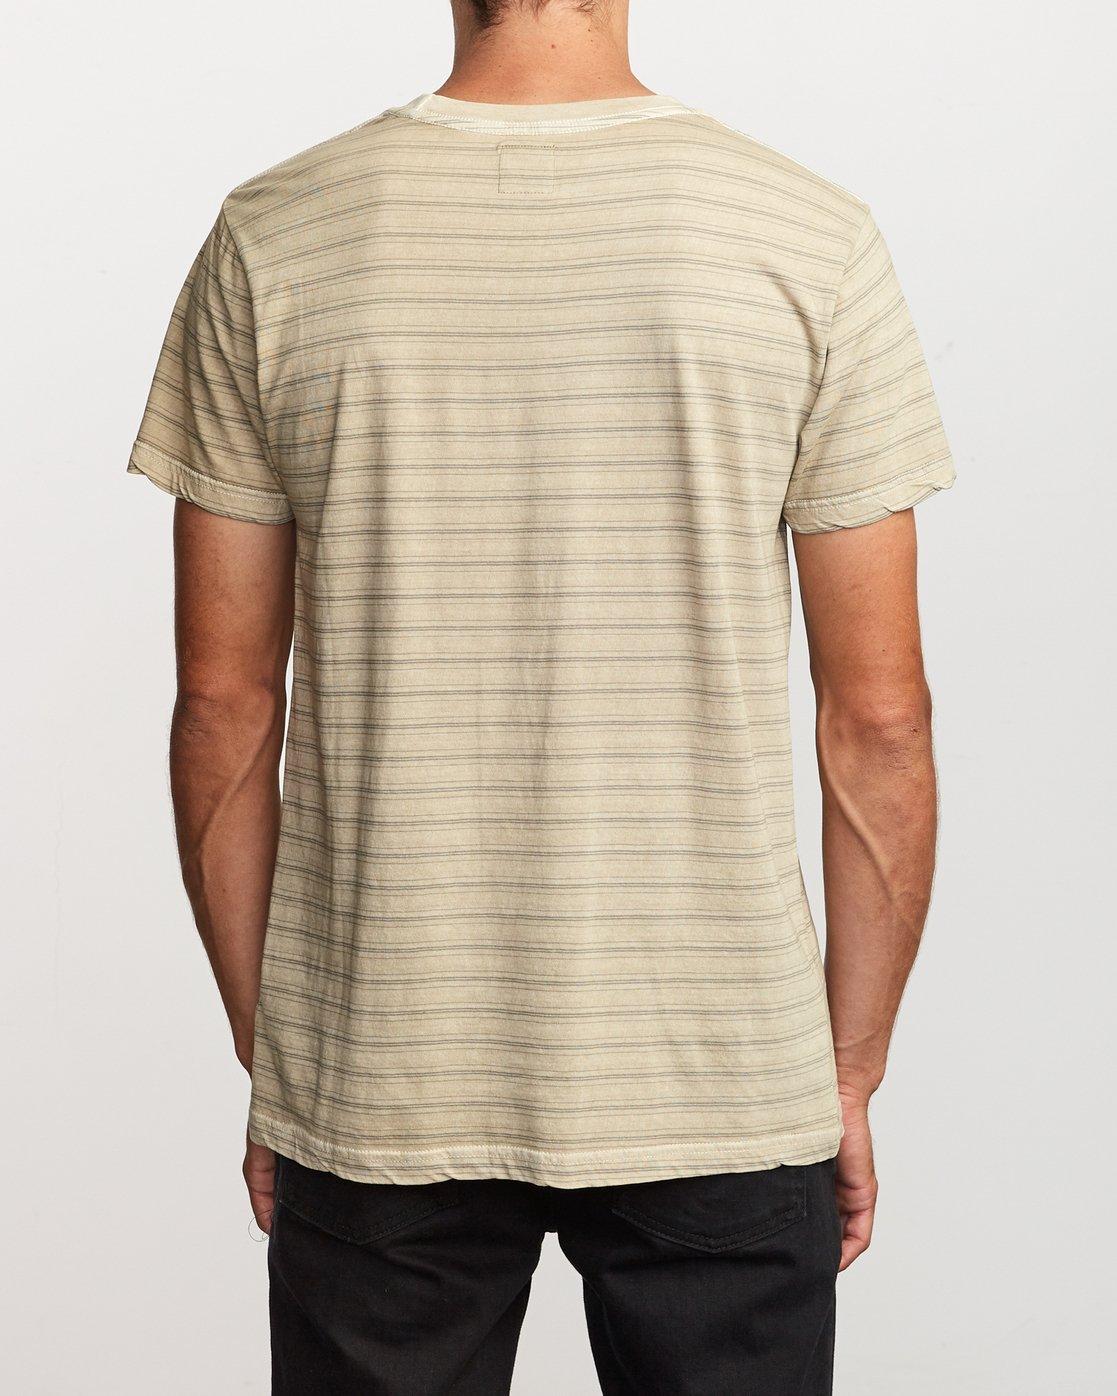 3 Saturation Stripe Knit T-Shirt Yellow M901VRSS RVCA